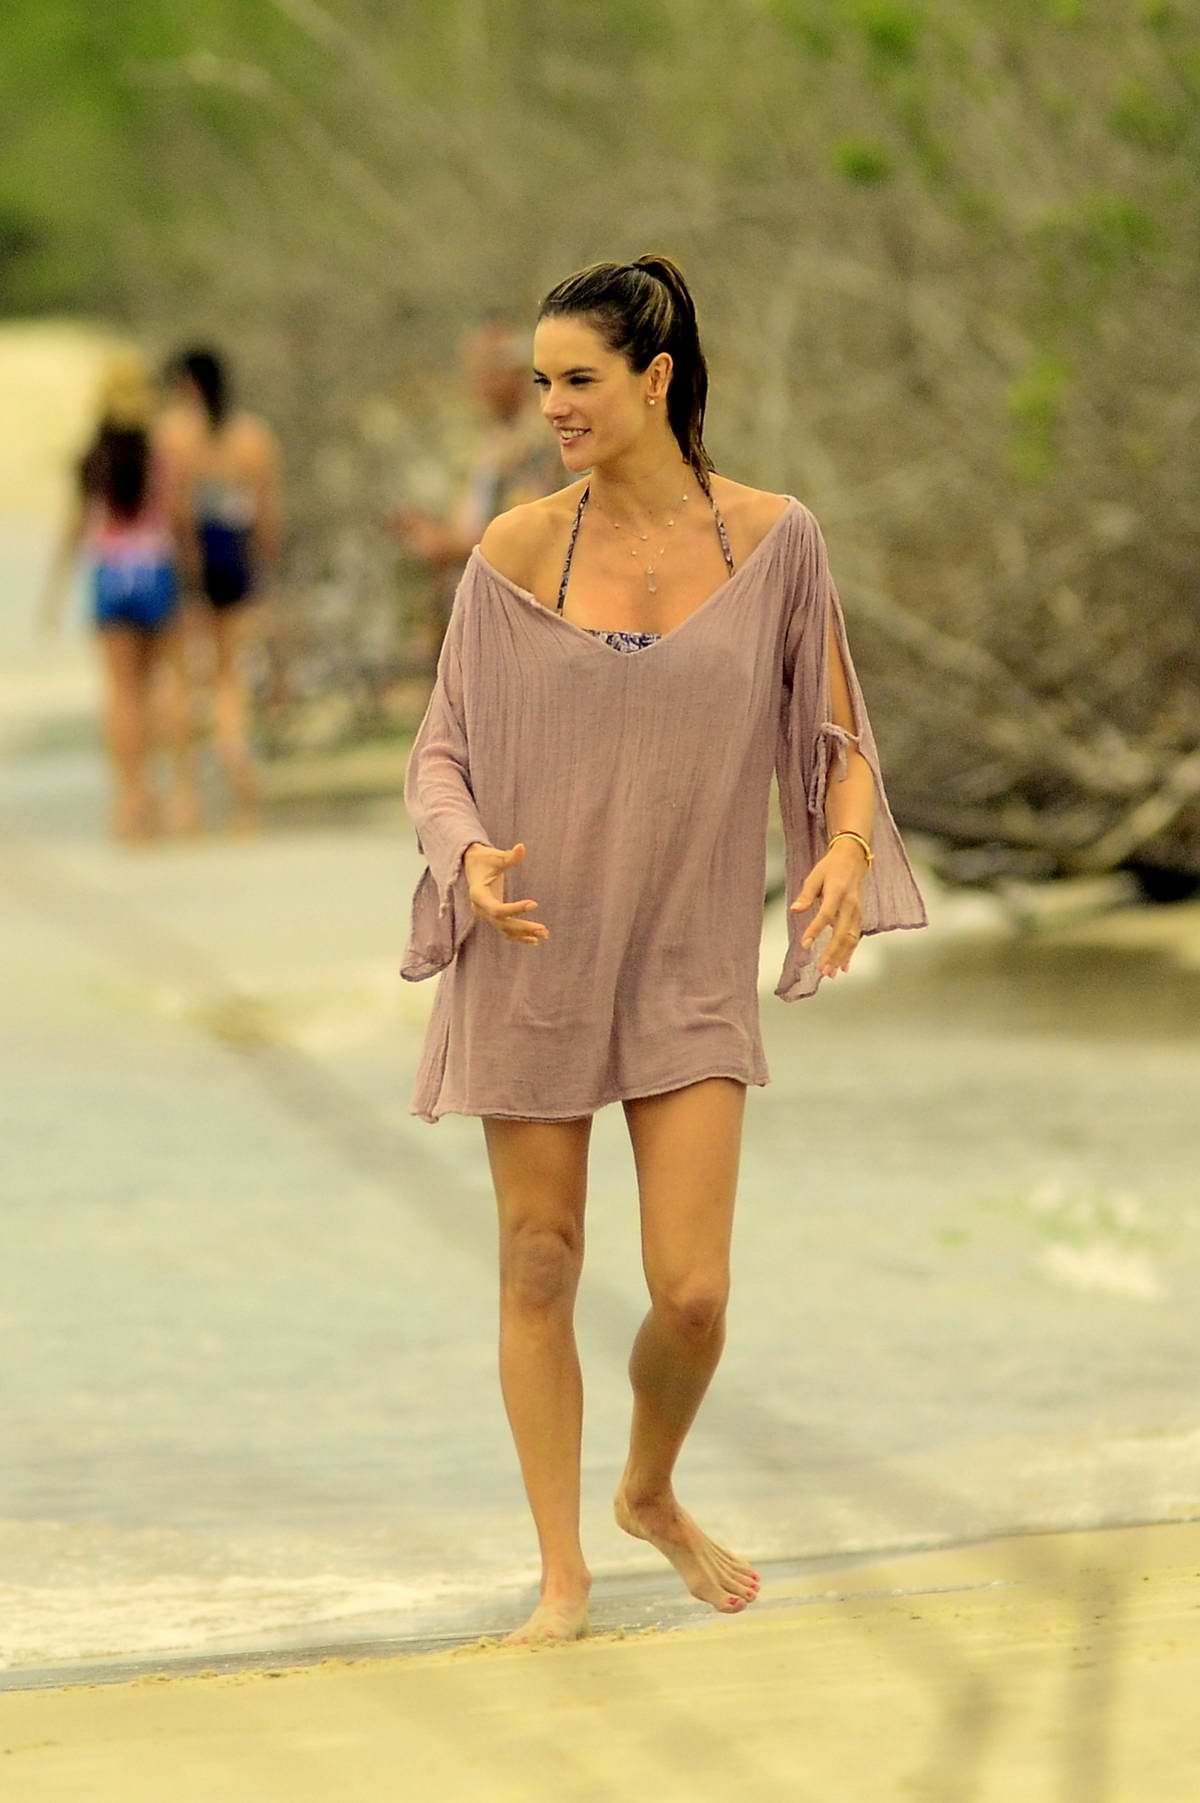 Alessandra Ambrosio on a Beach in Rio de Janeiro - GotCeleb